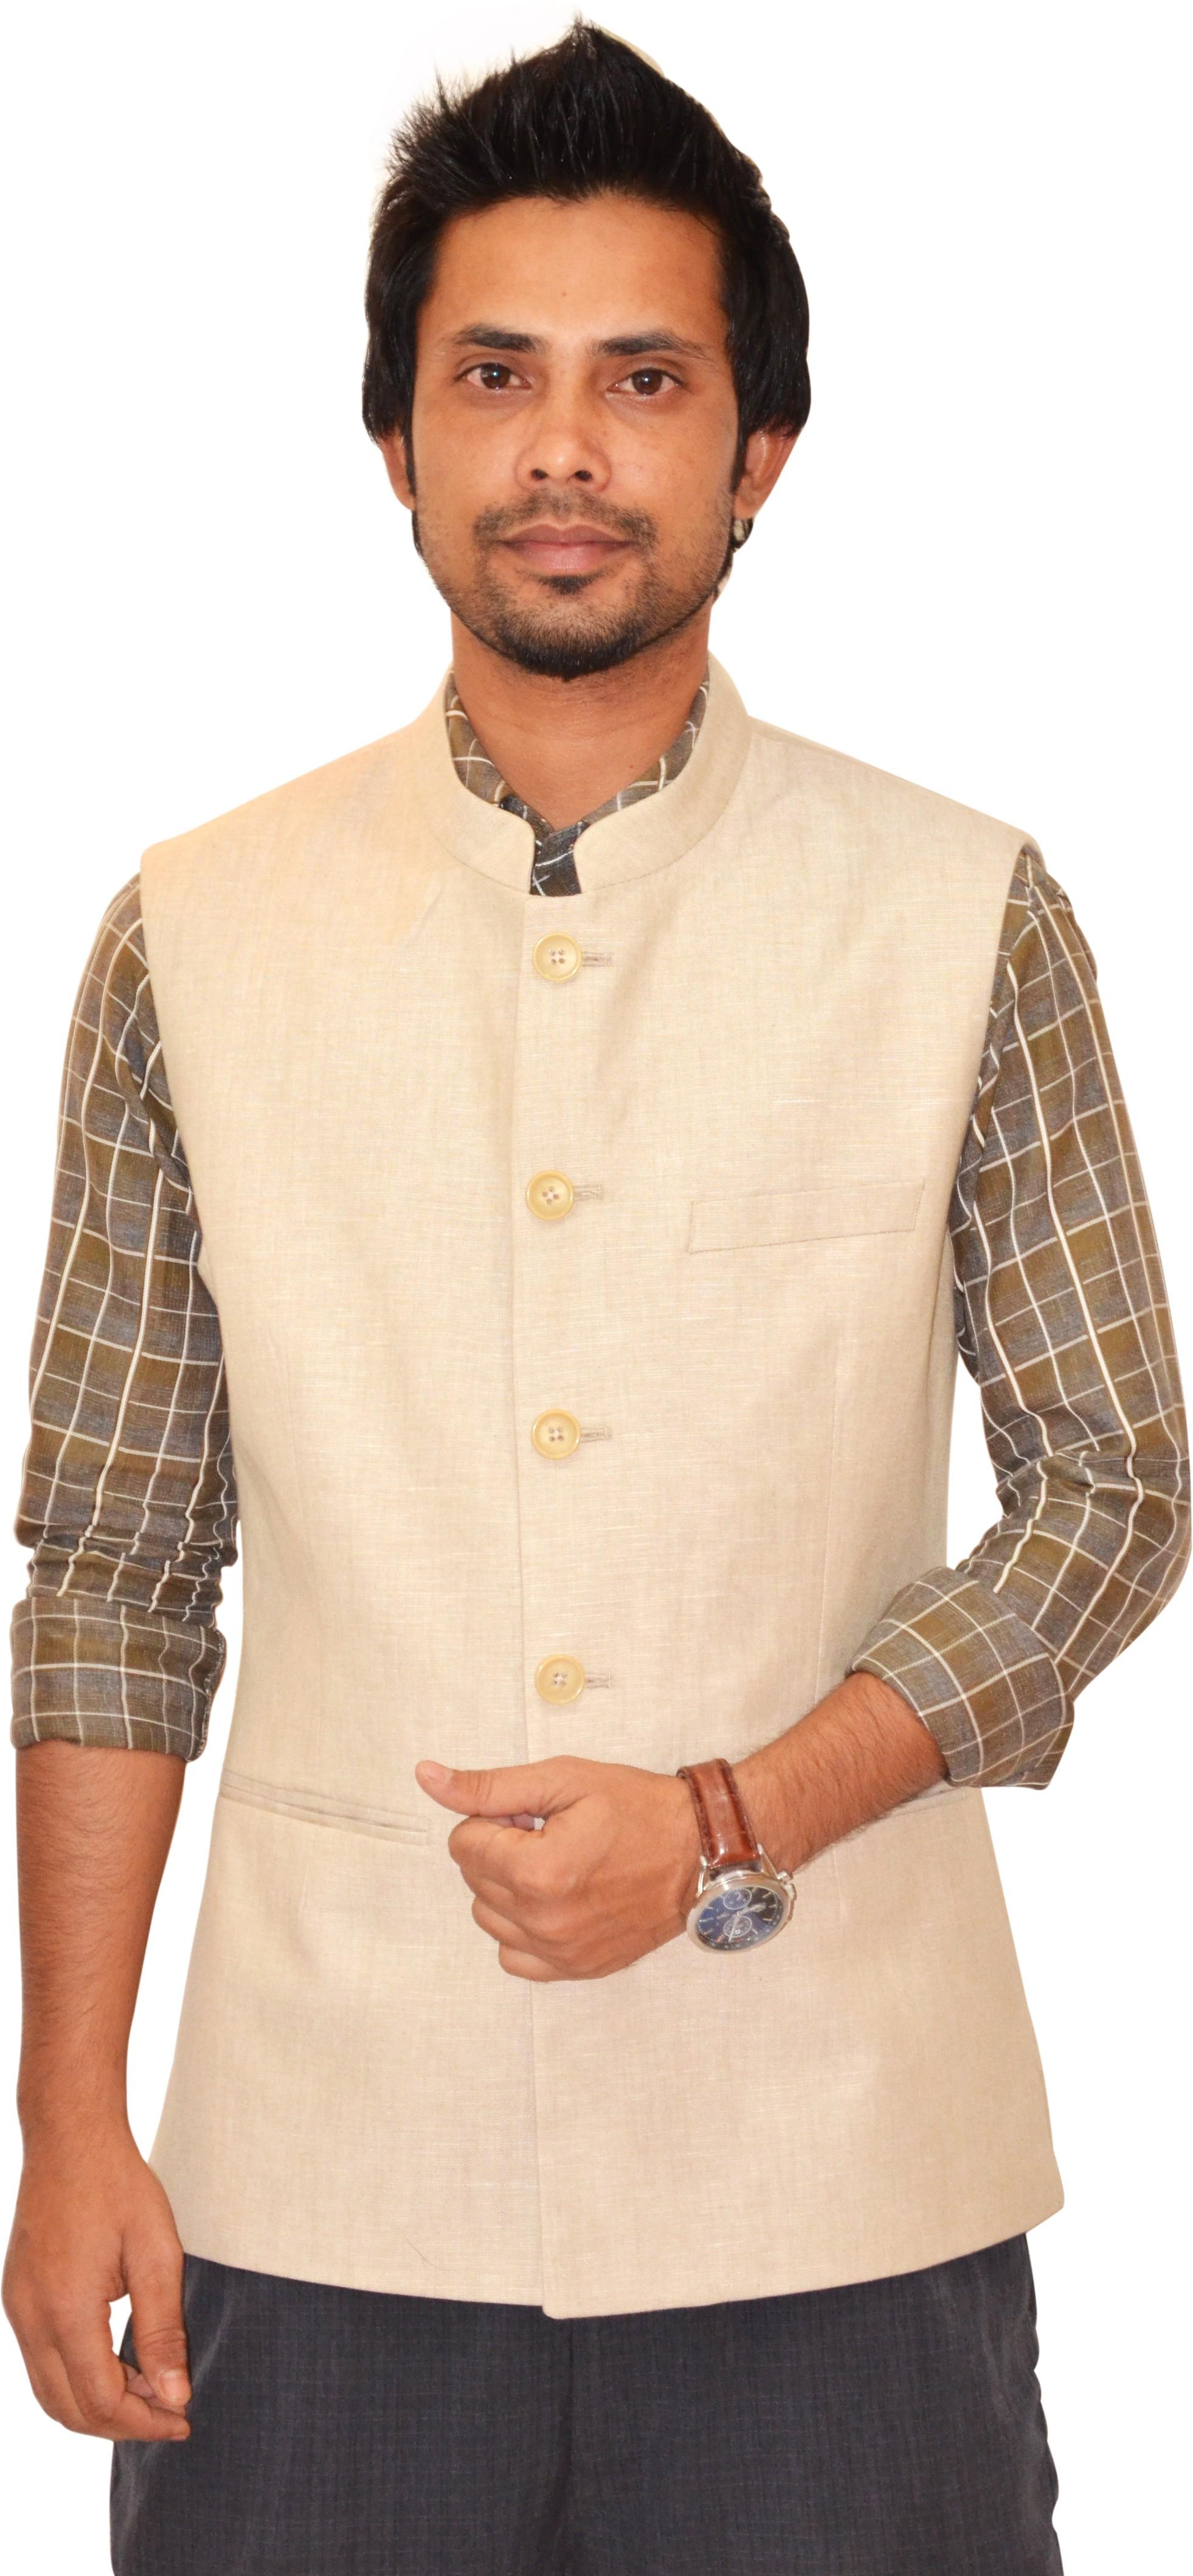 Astitva Sleeveless Solid Men's Nehru Jacket - Knit Wear